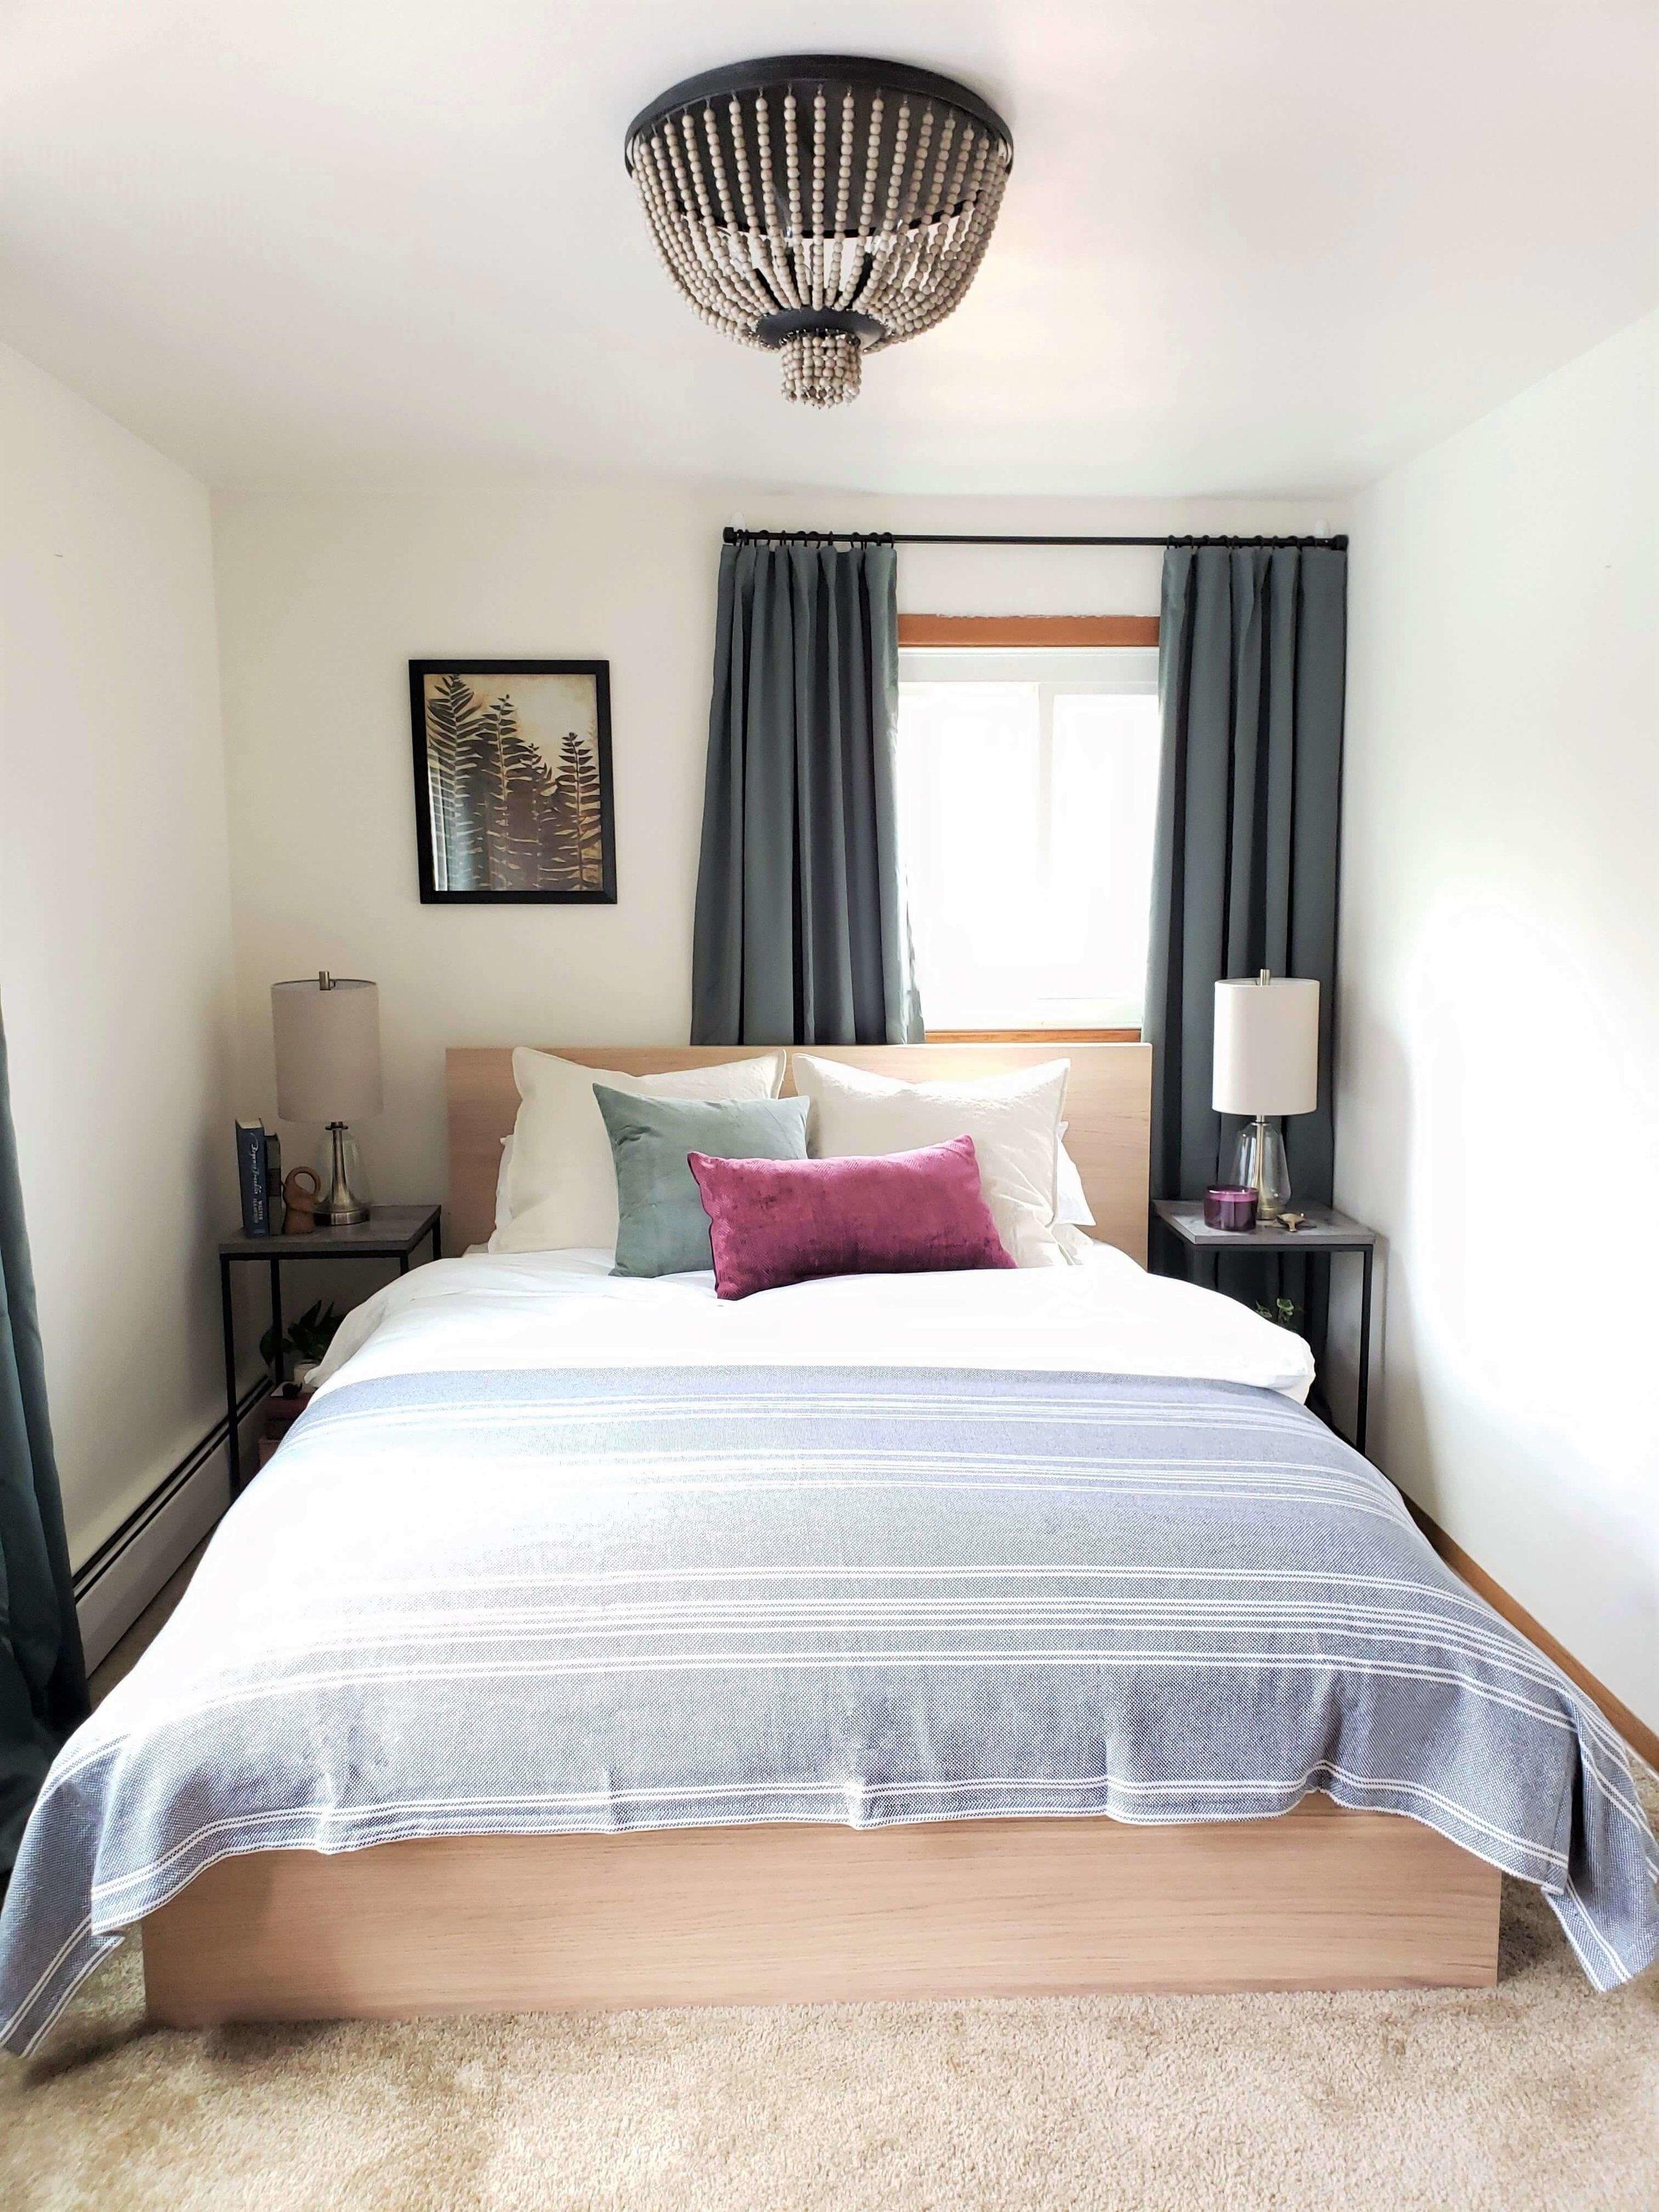 Fall 2018 One Room Challenge Week 6 Boho Bedroom Final Reveal Nicole Janes Design